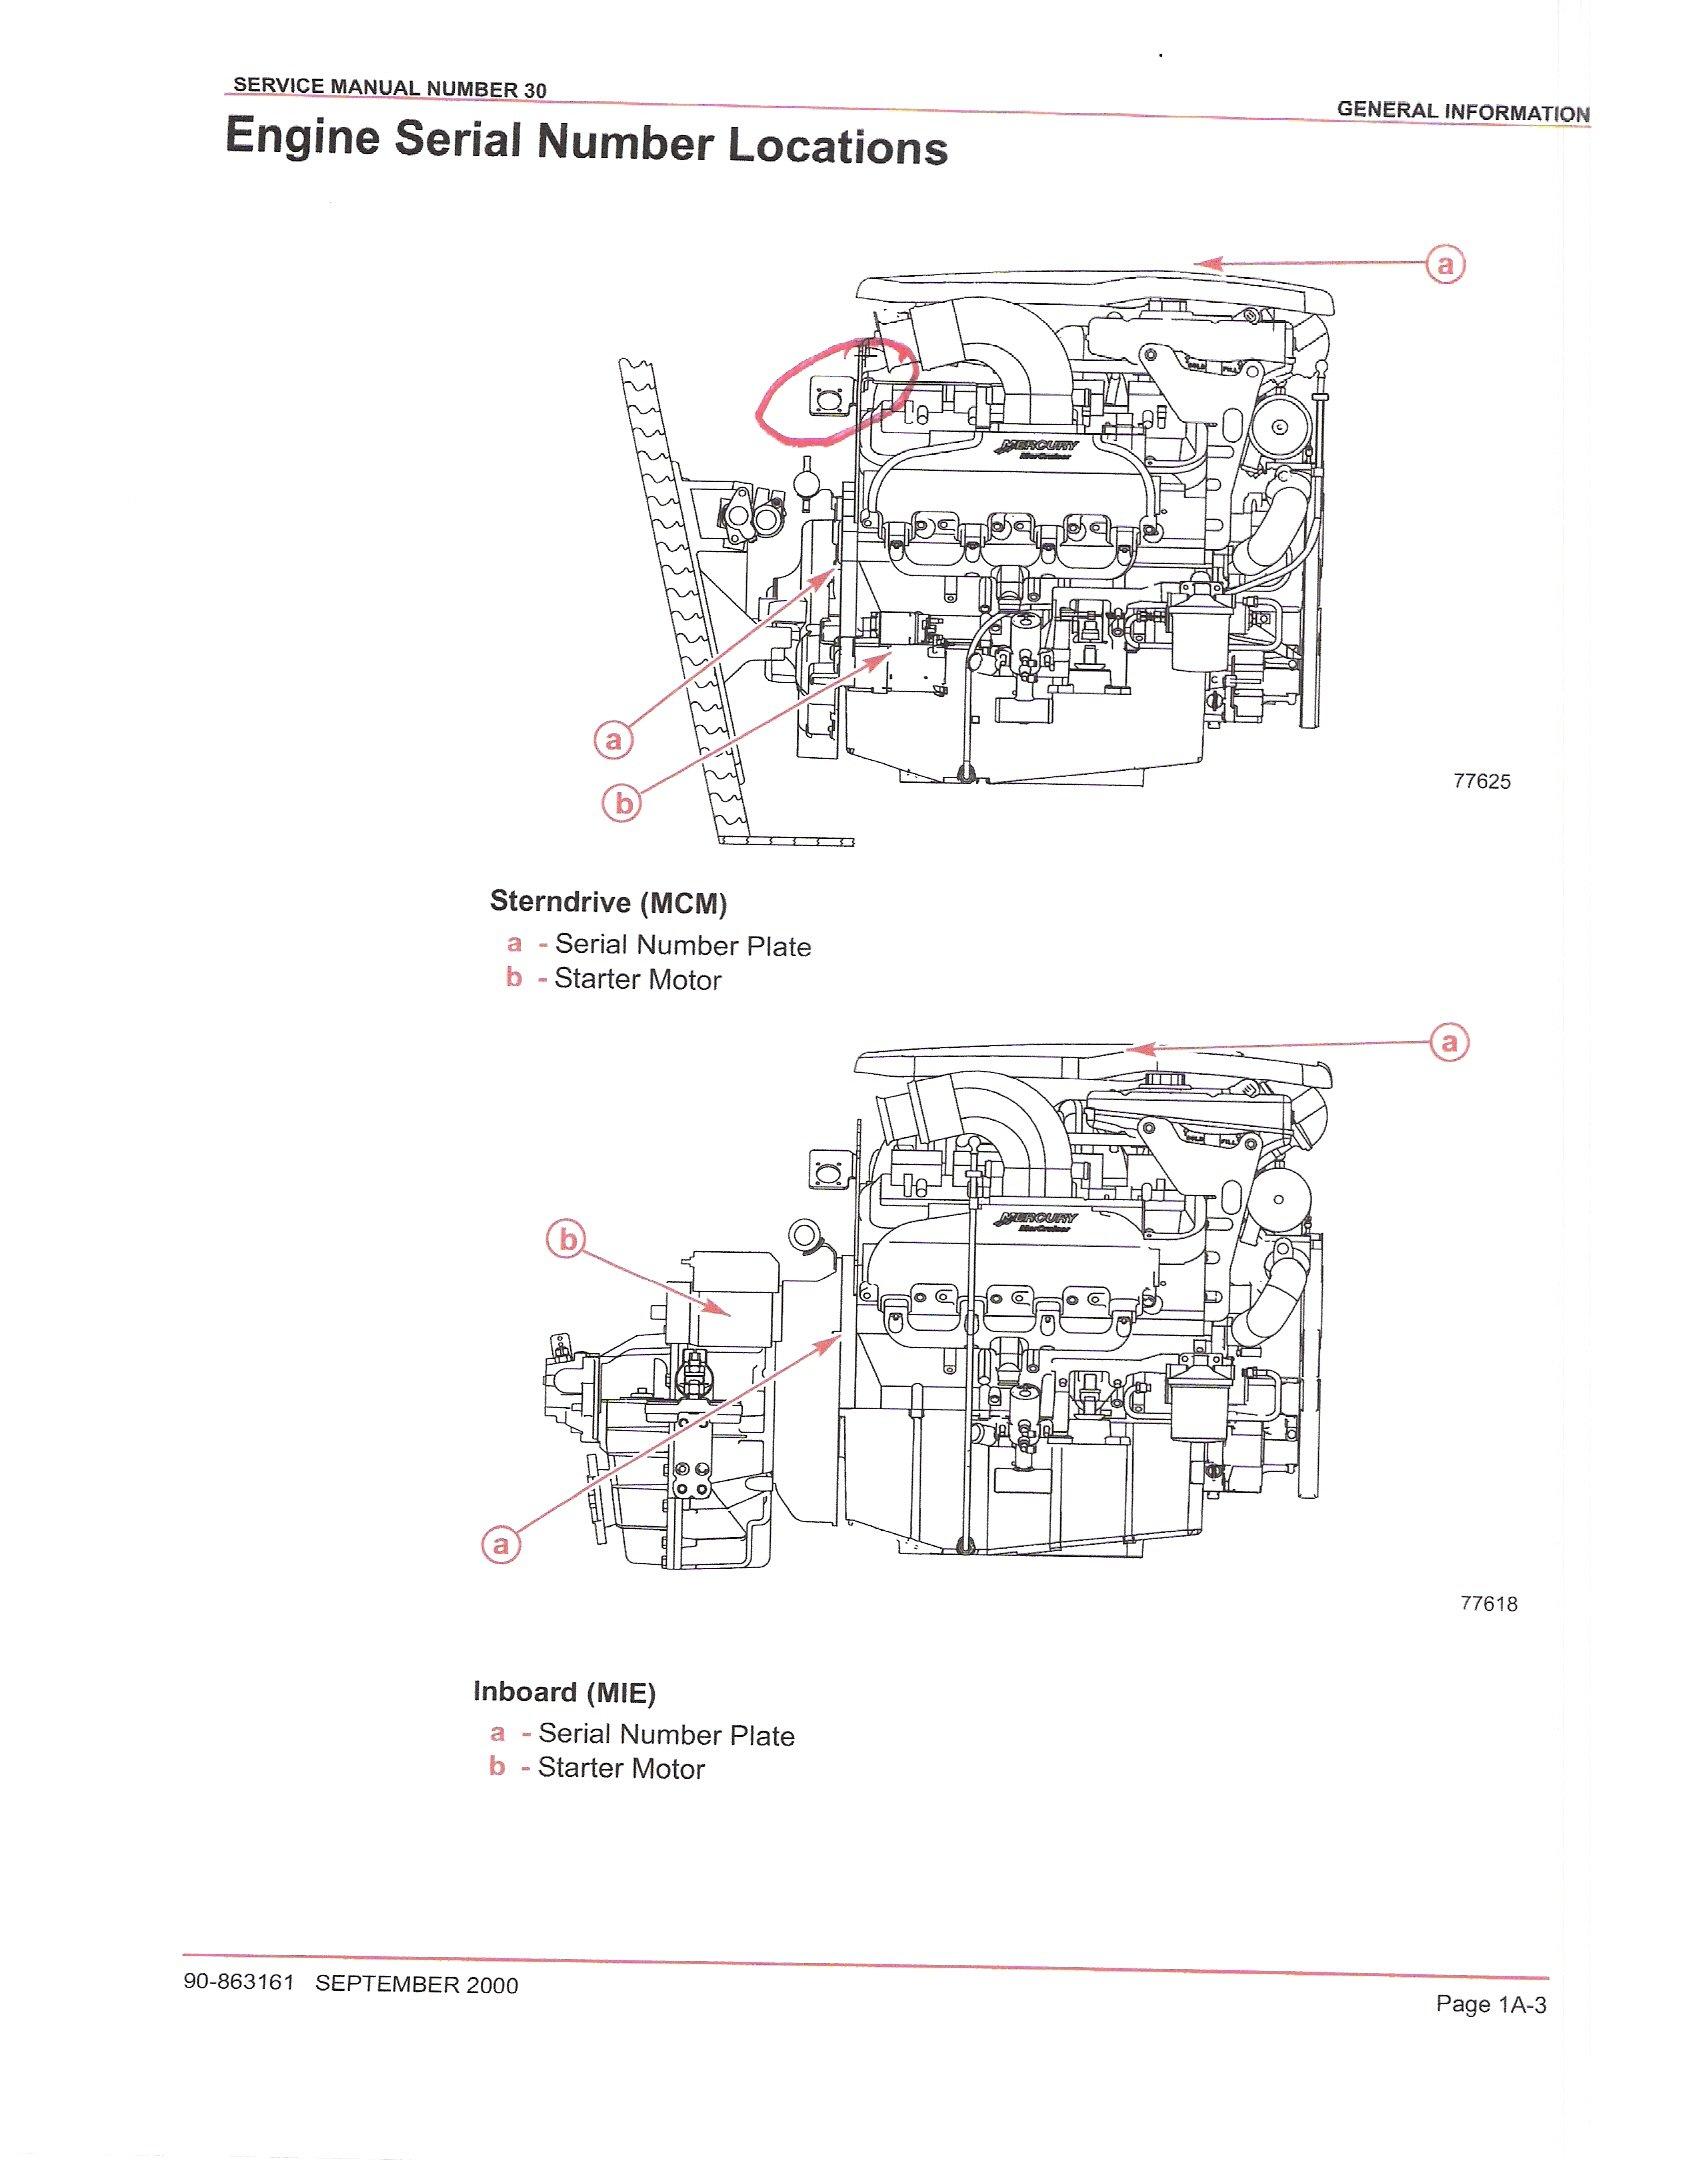 2001 baja mercruiser 496 ho engine 1 where is the location graphic